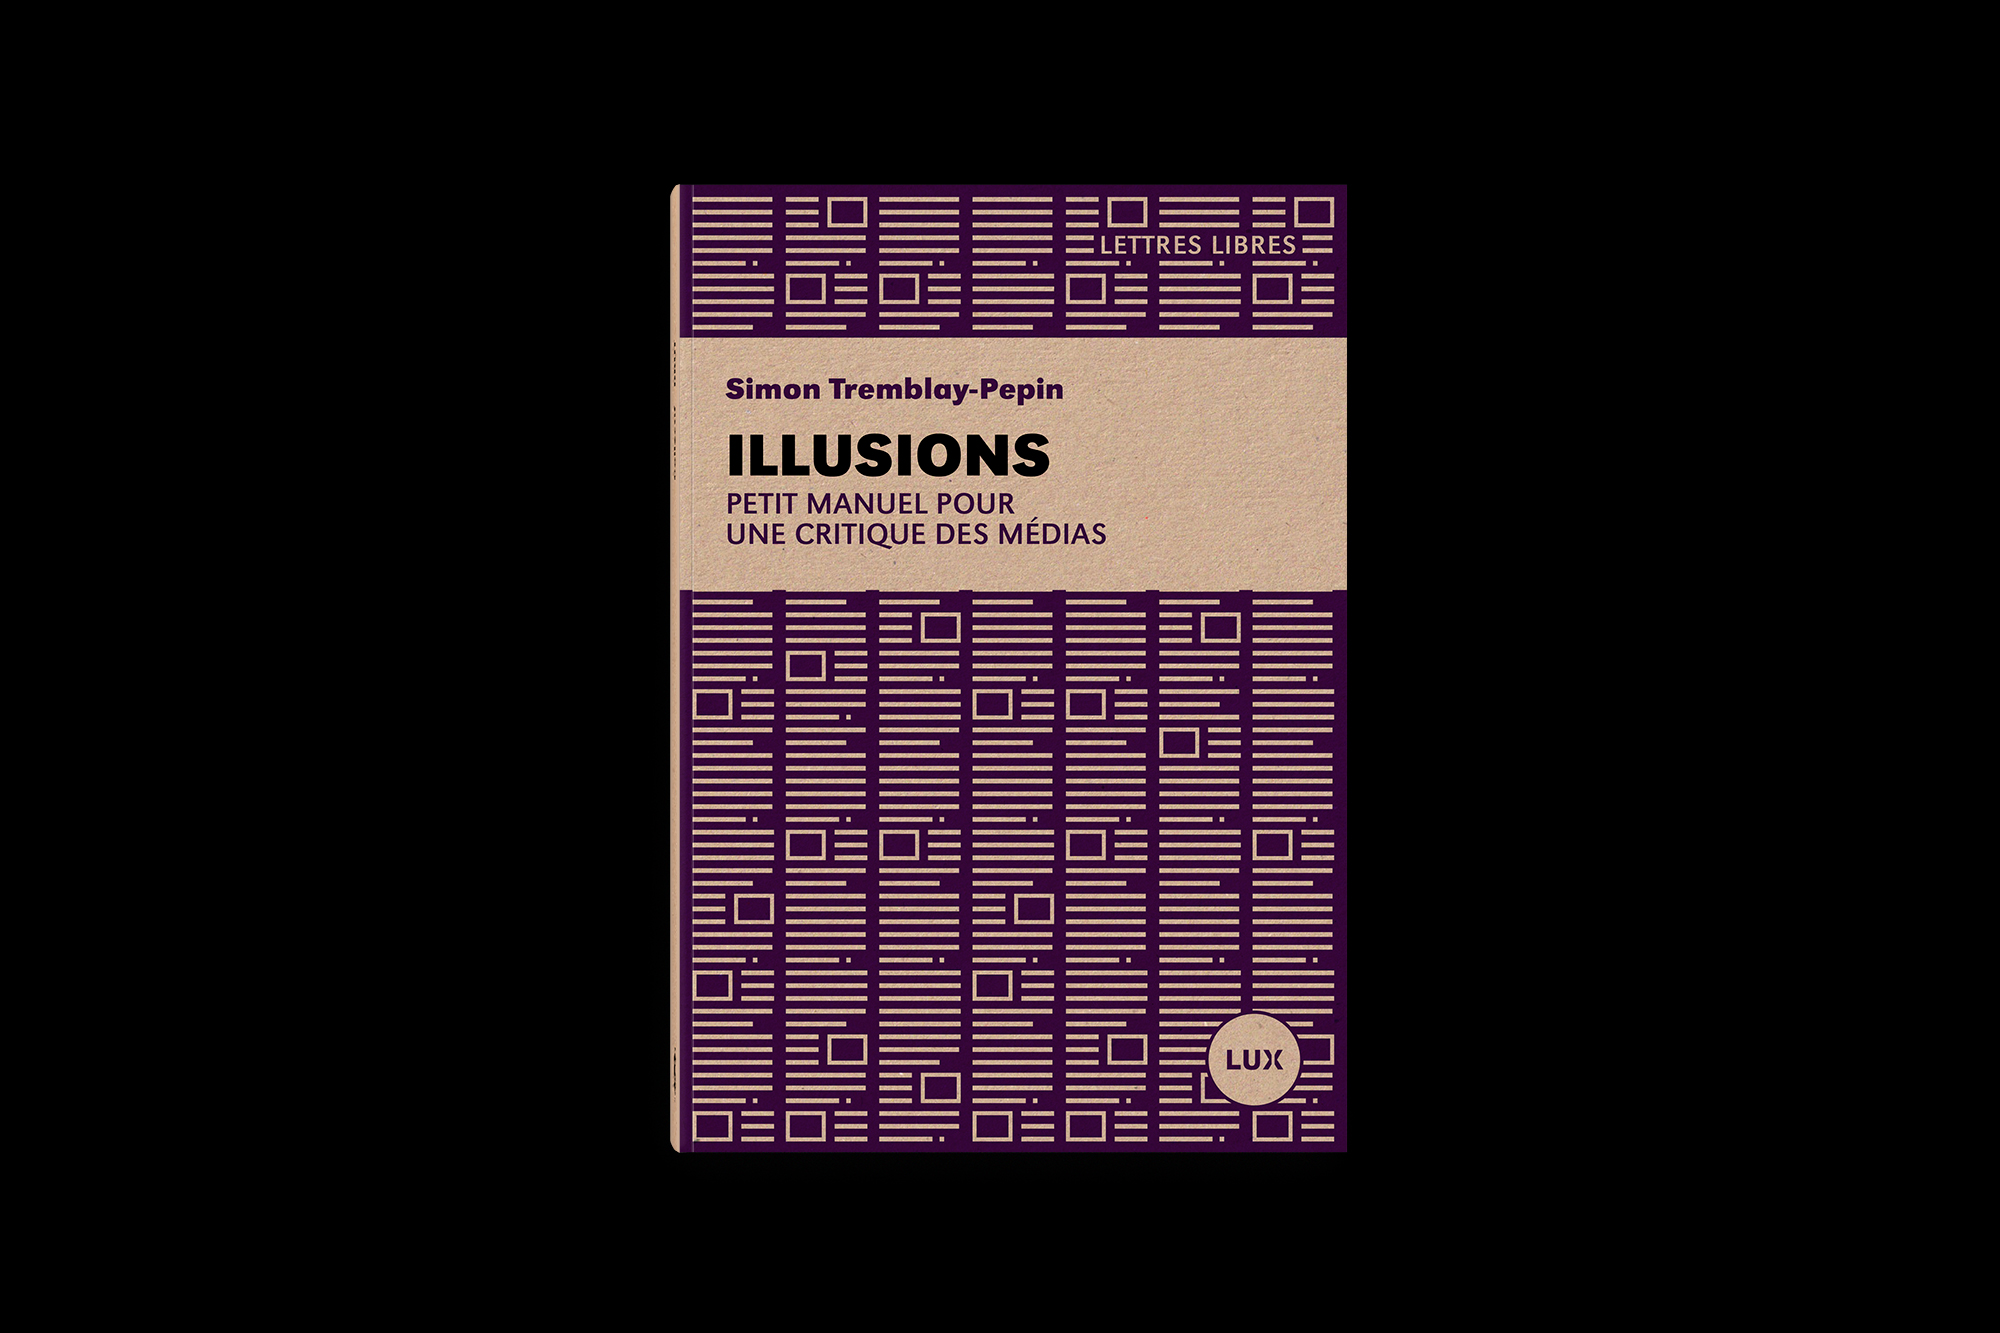 Lettres-libres-mockup-Illusions